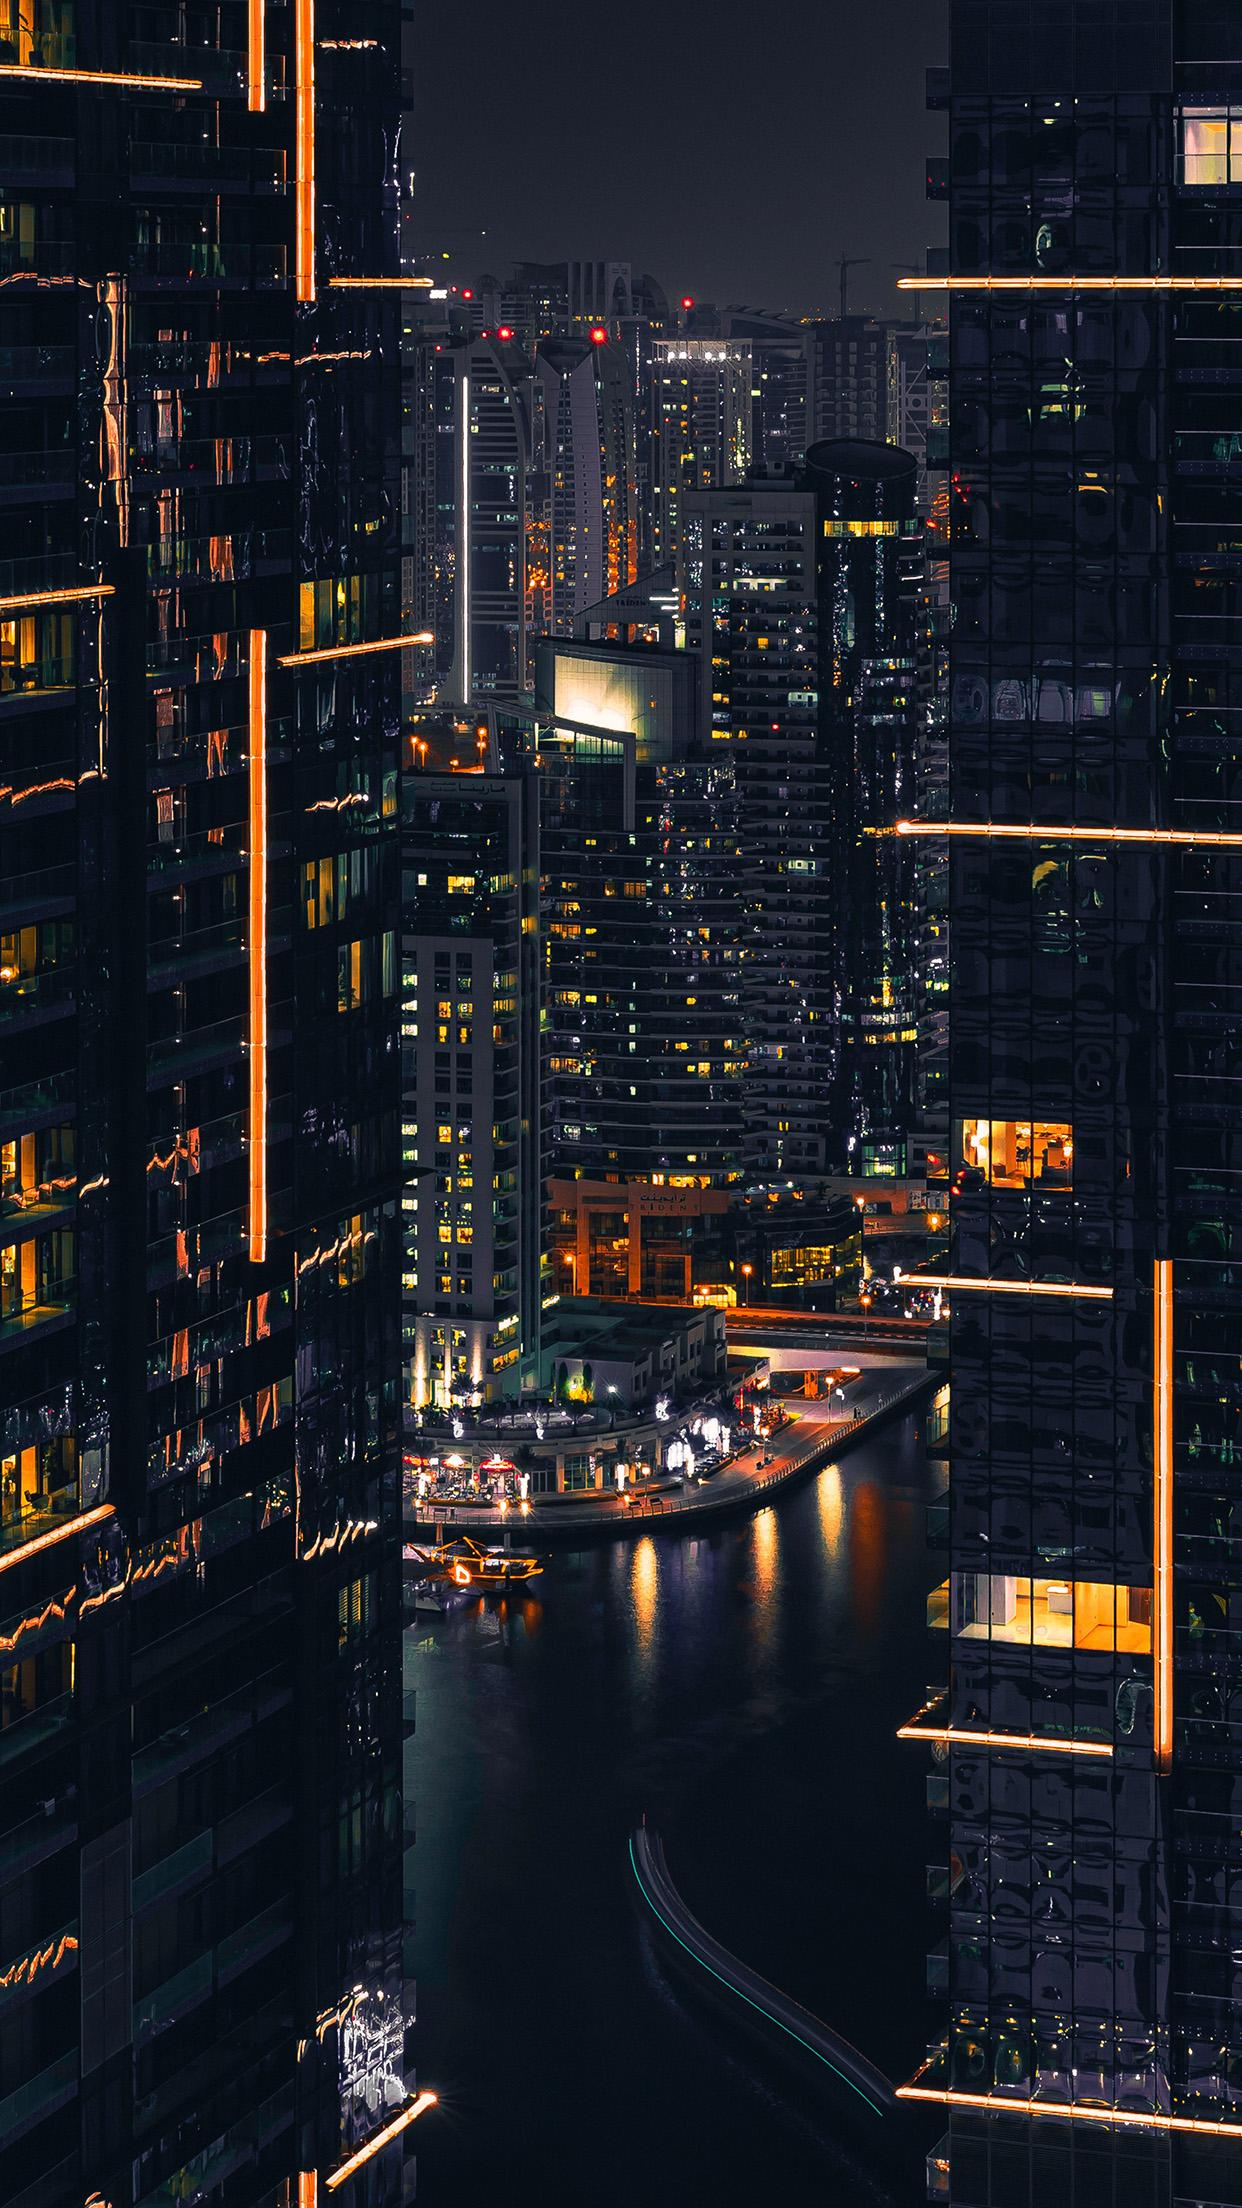 od12 nature city night building architecture wallpaper